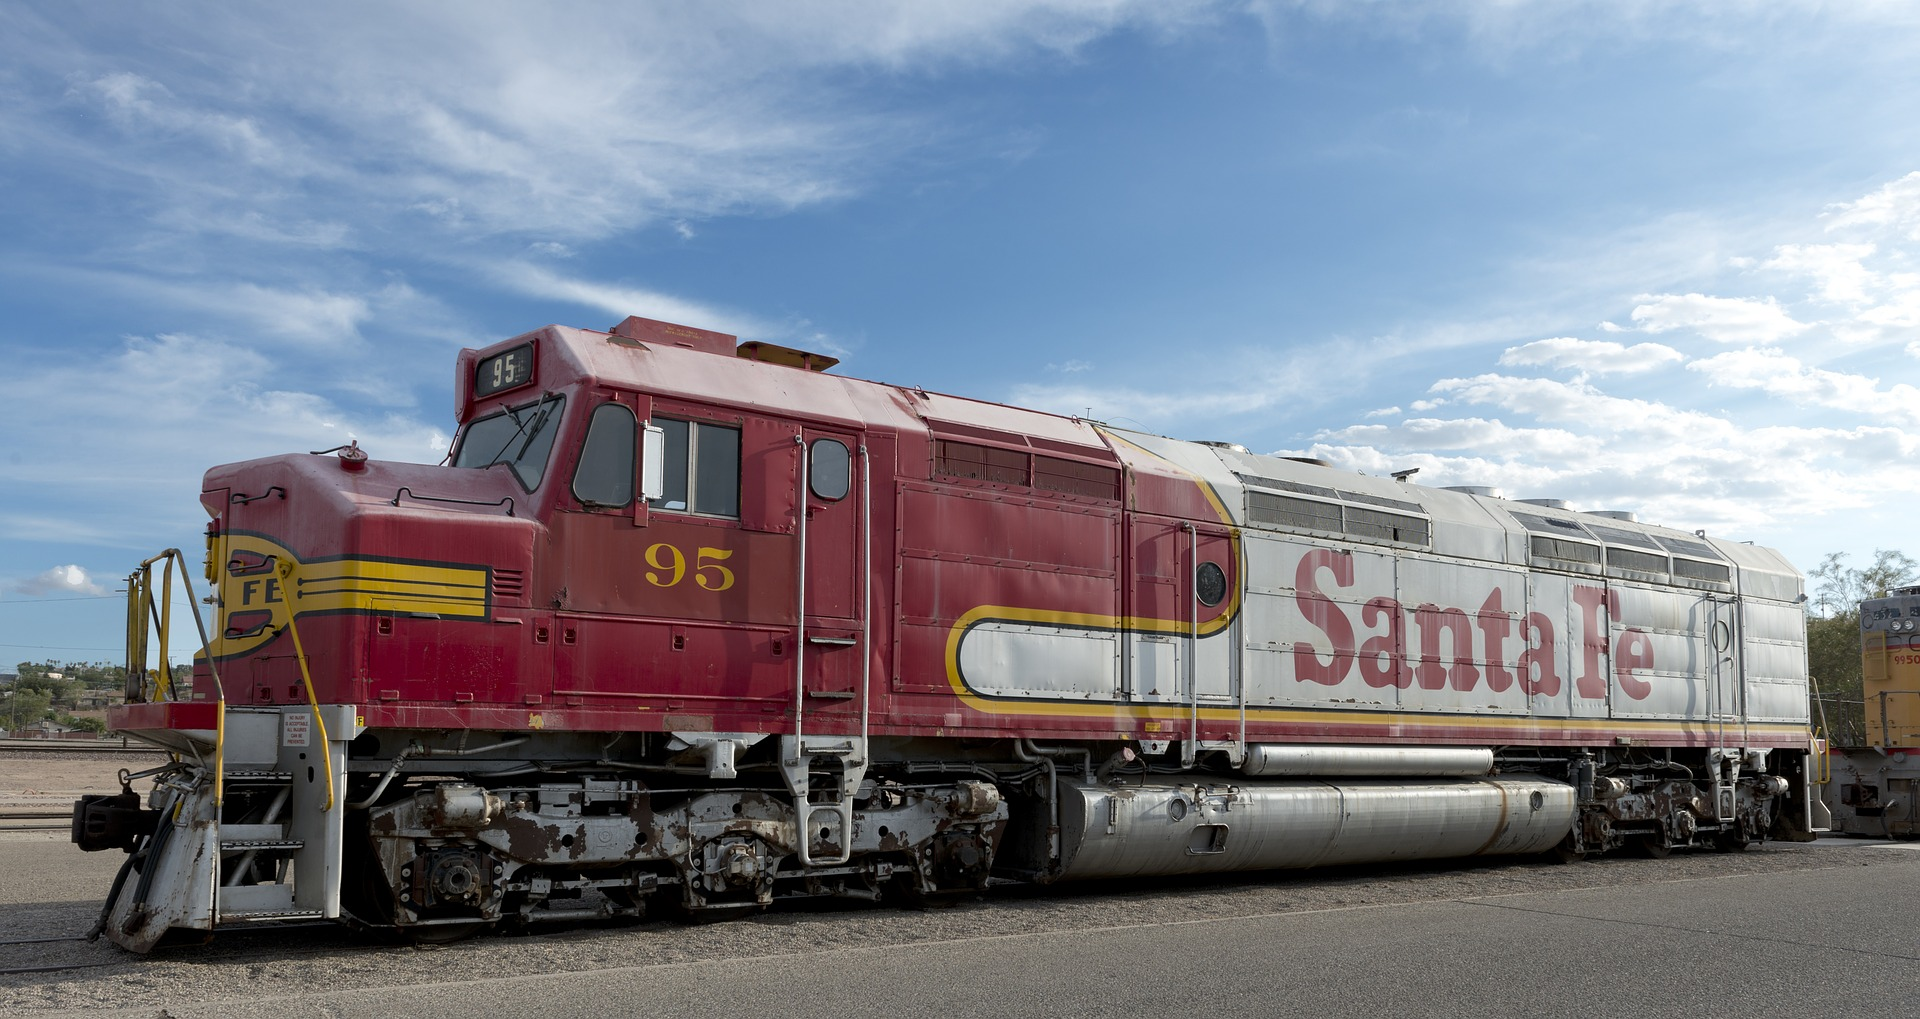 Santa Fe railroad engine on desert tracks.